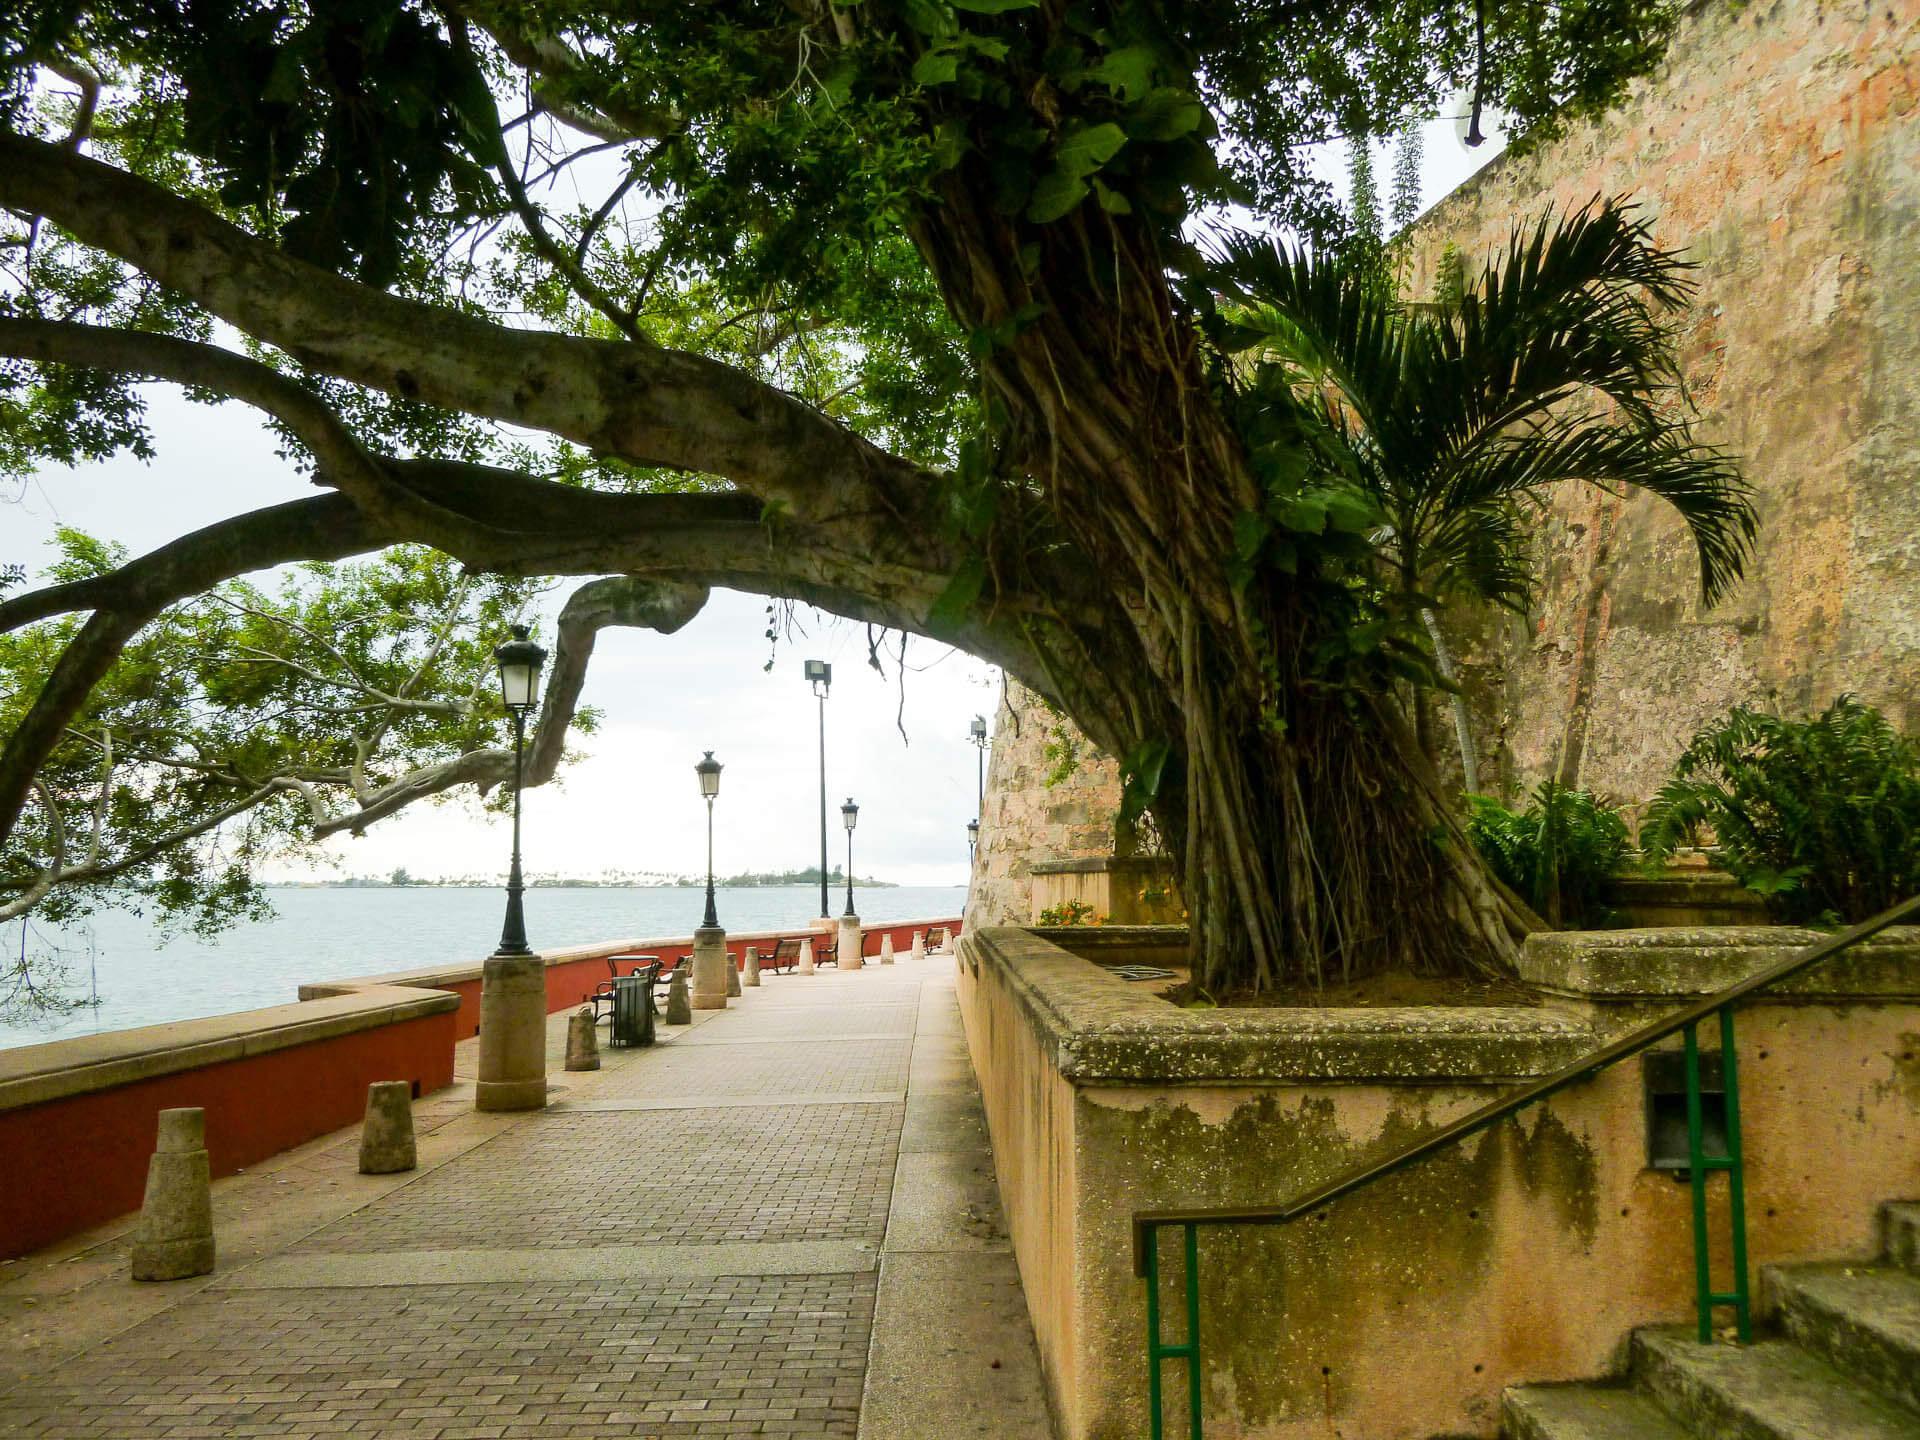 Old San Juan city walls